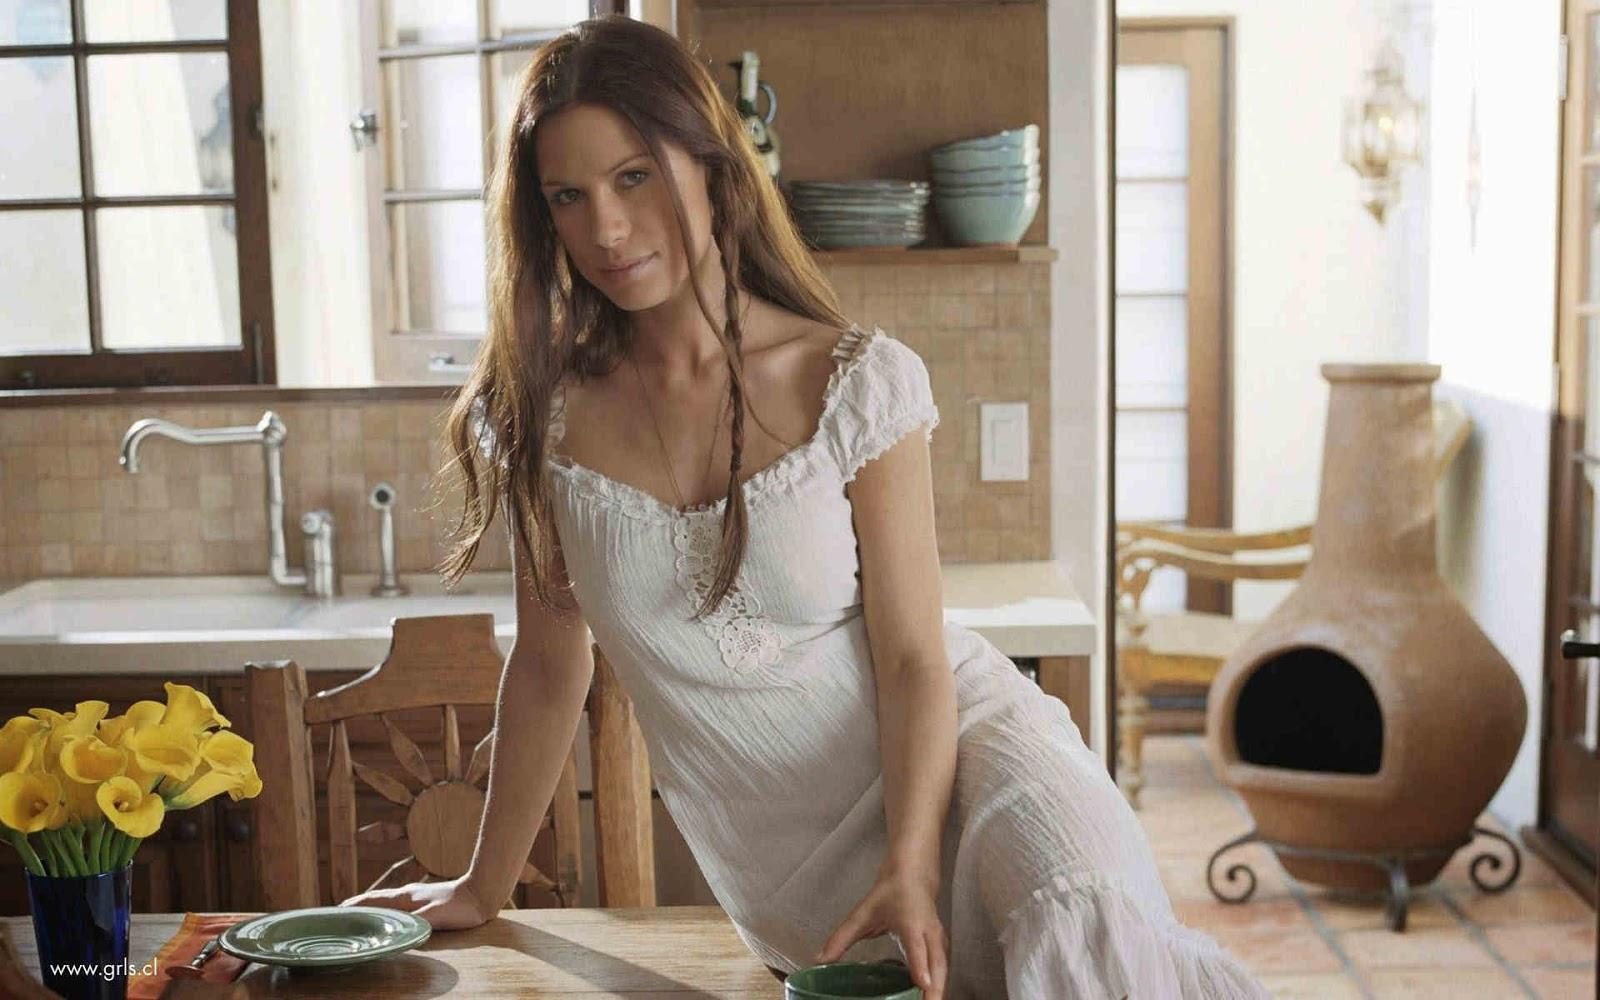 Provocative Rhona Mitra Buxom Beauty European Celebrities  HD 1600x1000